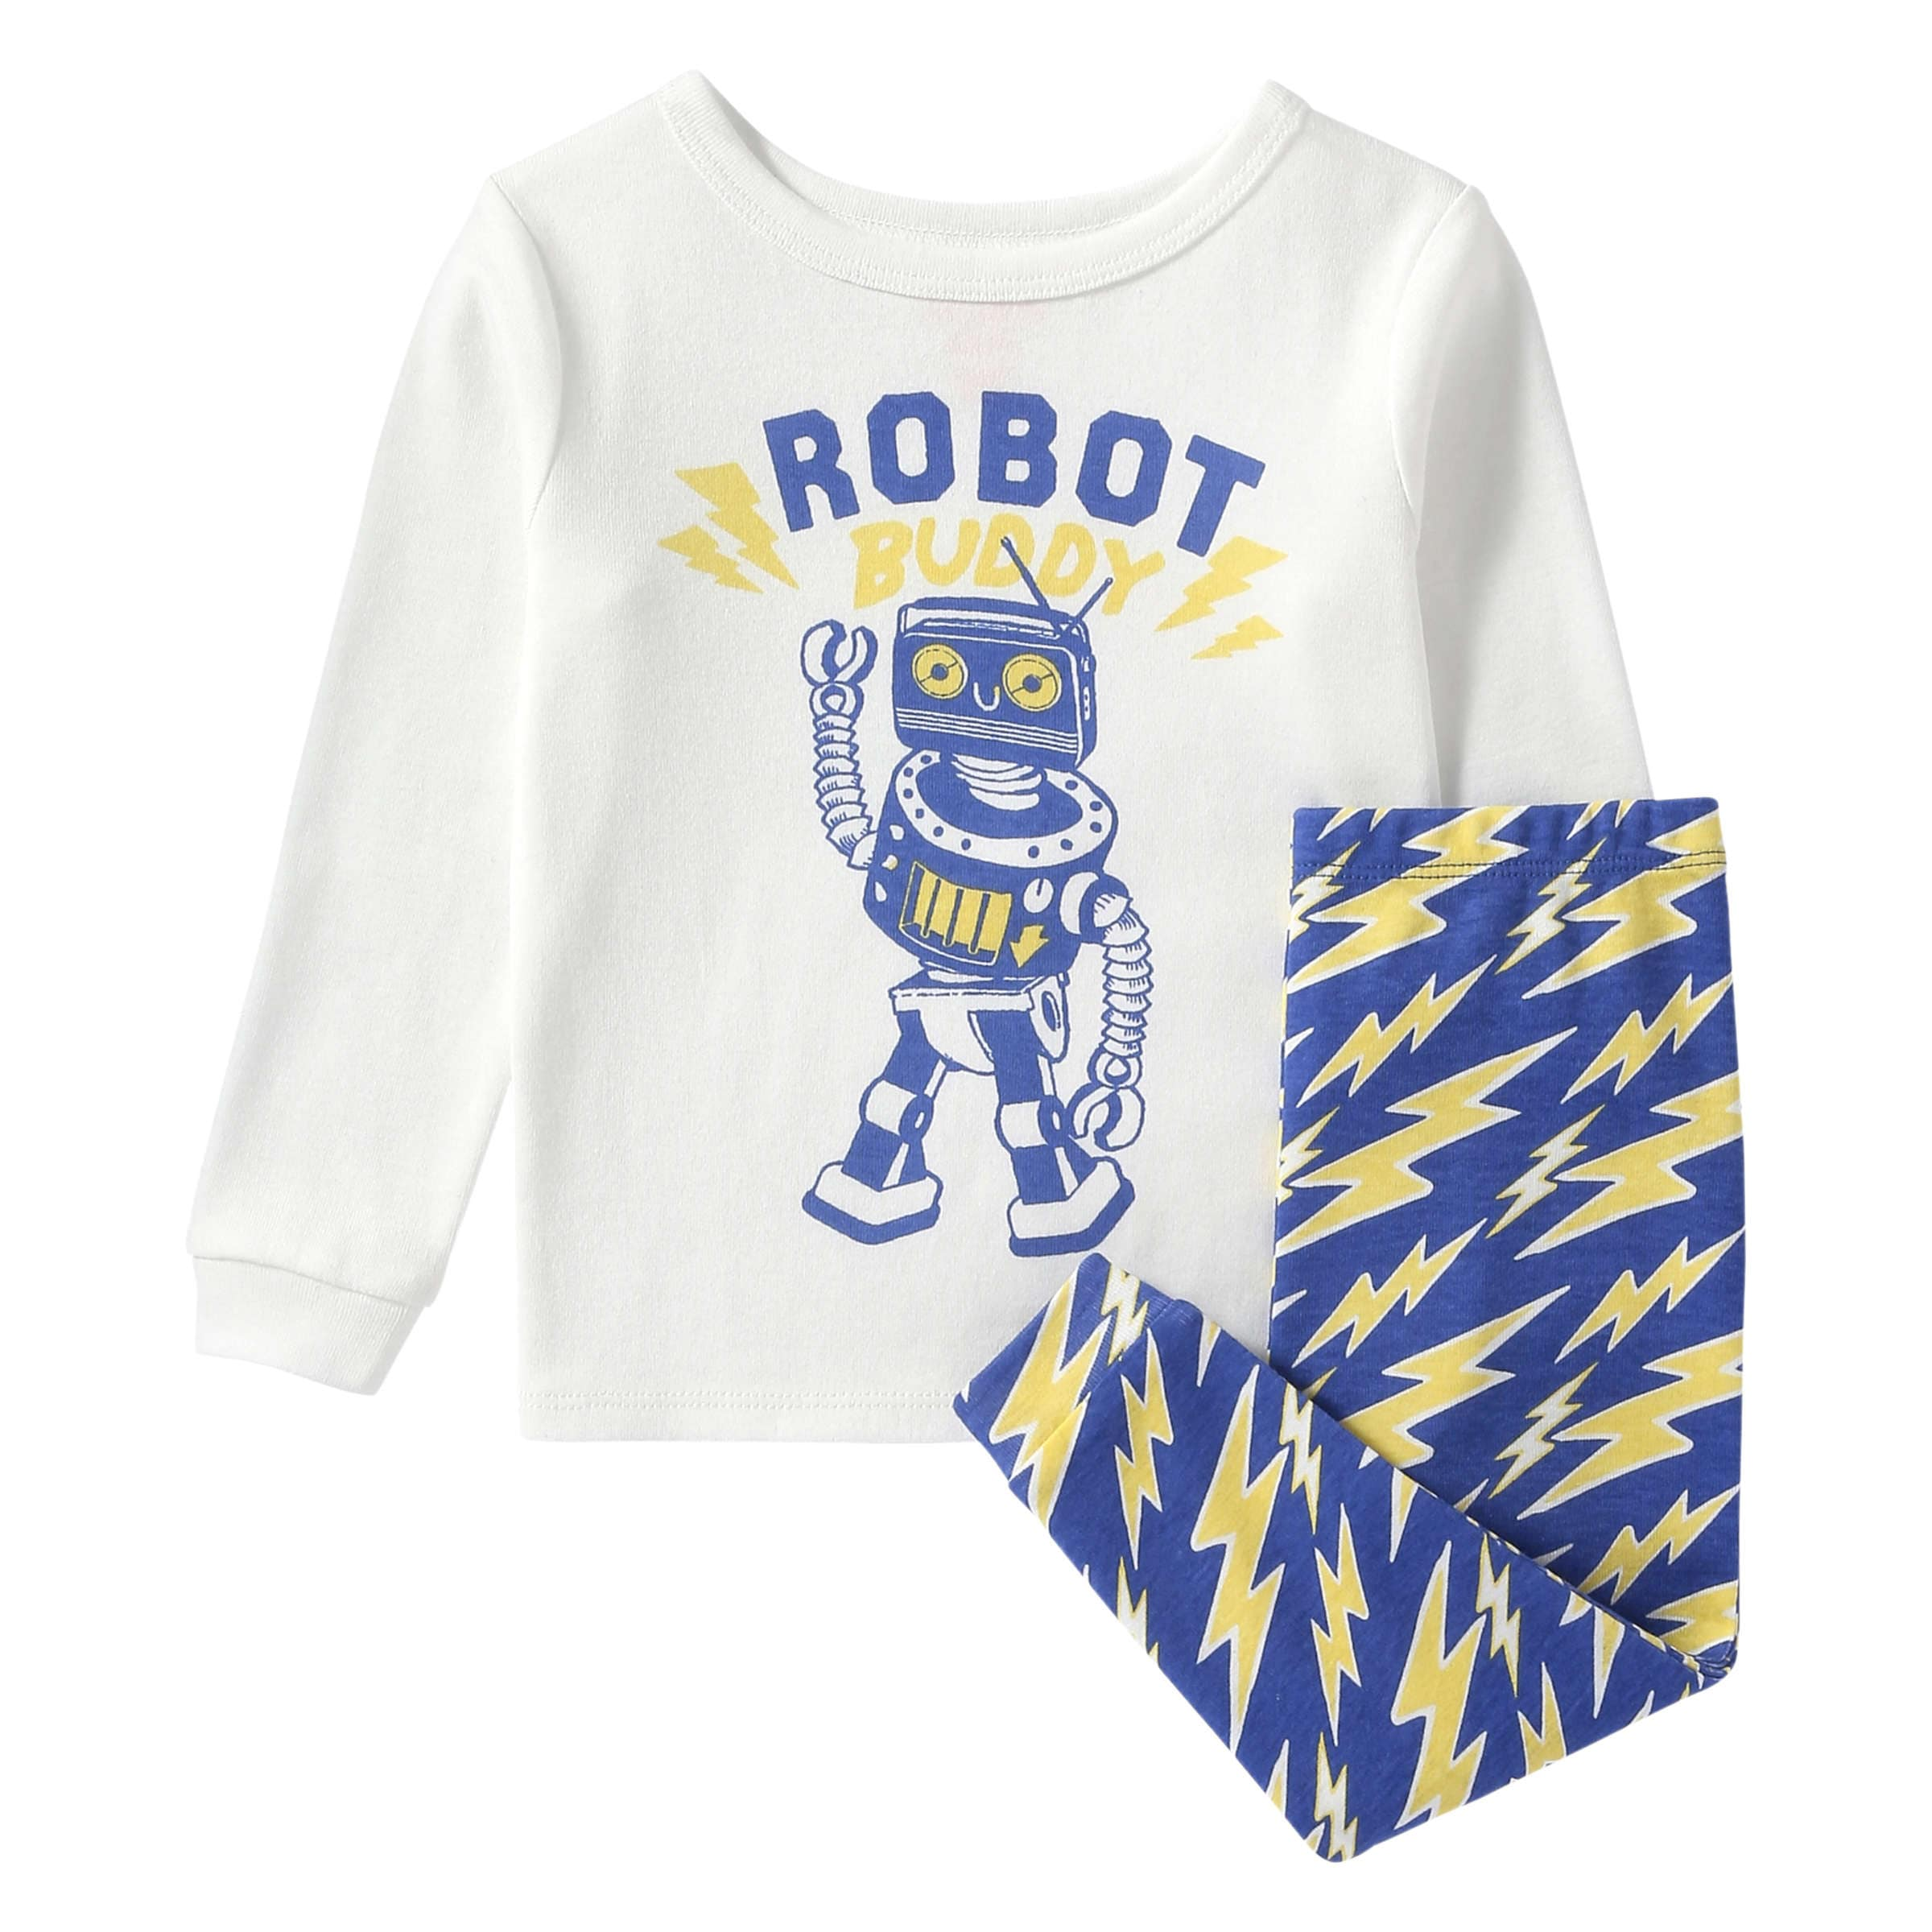 caea775e80 Baby Boys  Robot Print Sleep Set in White from Joe Fresh